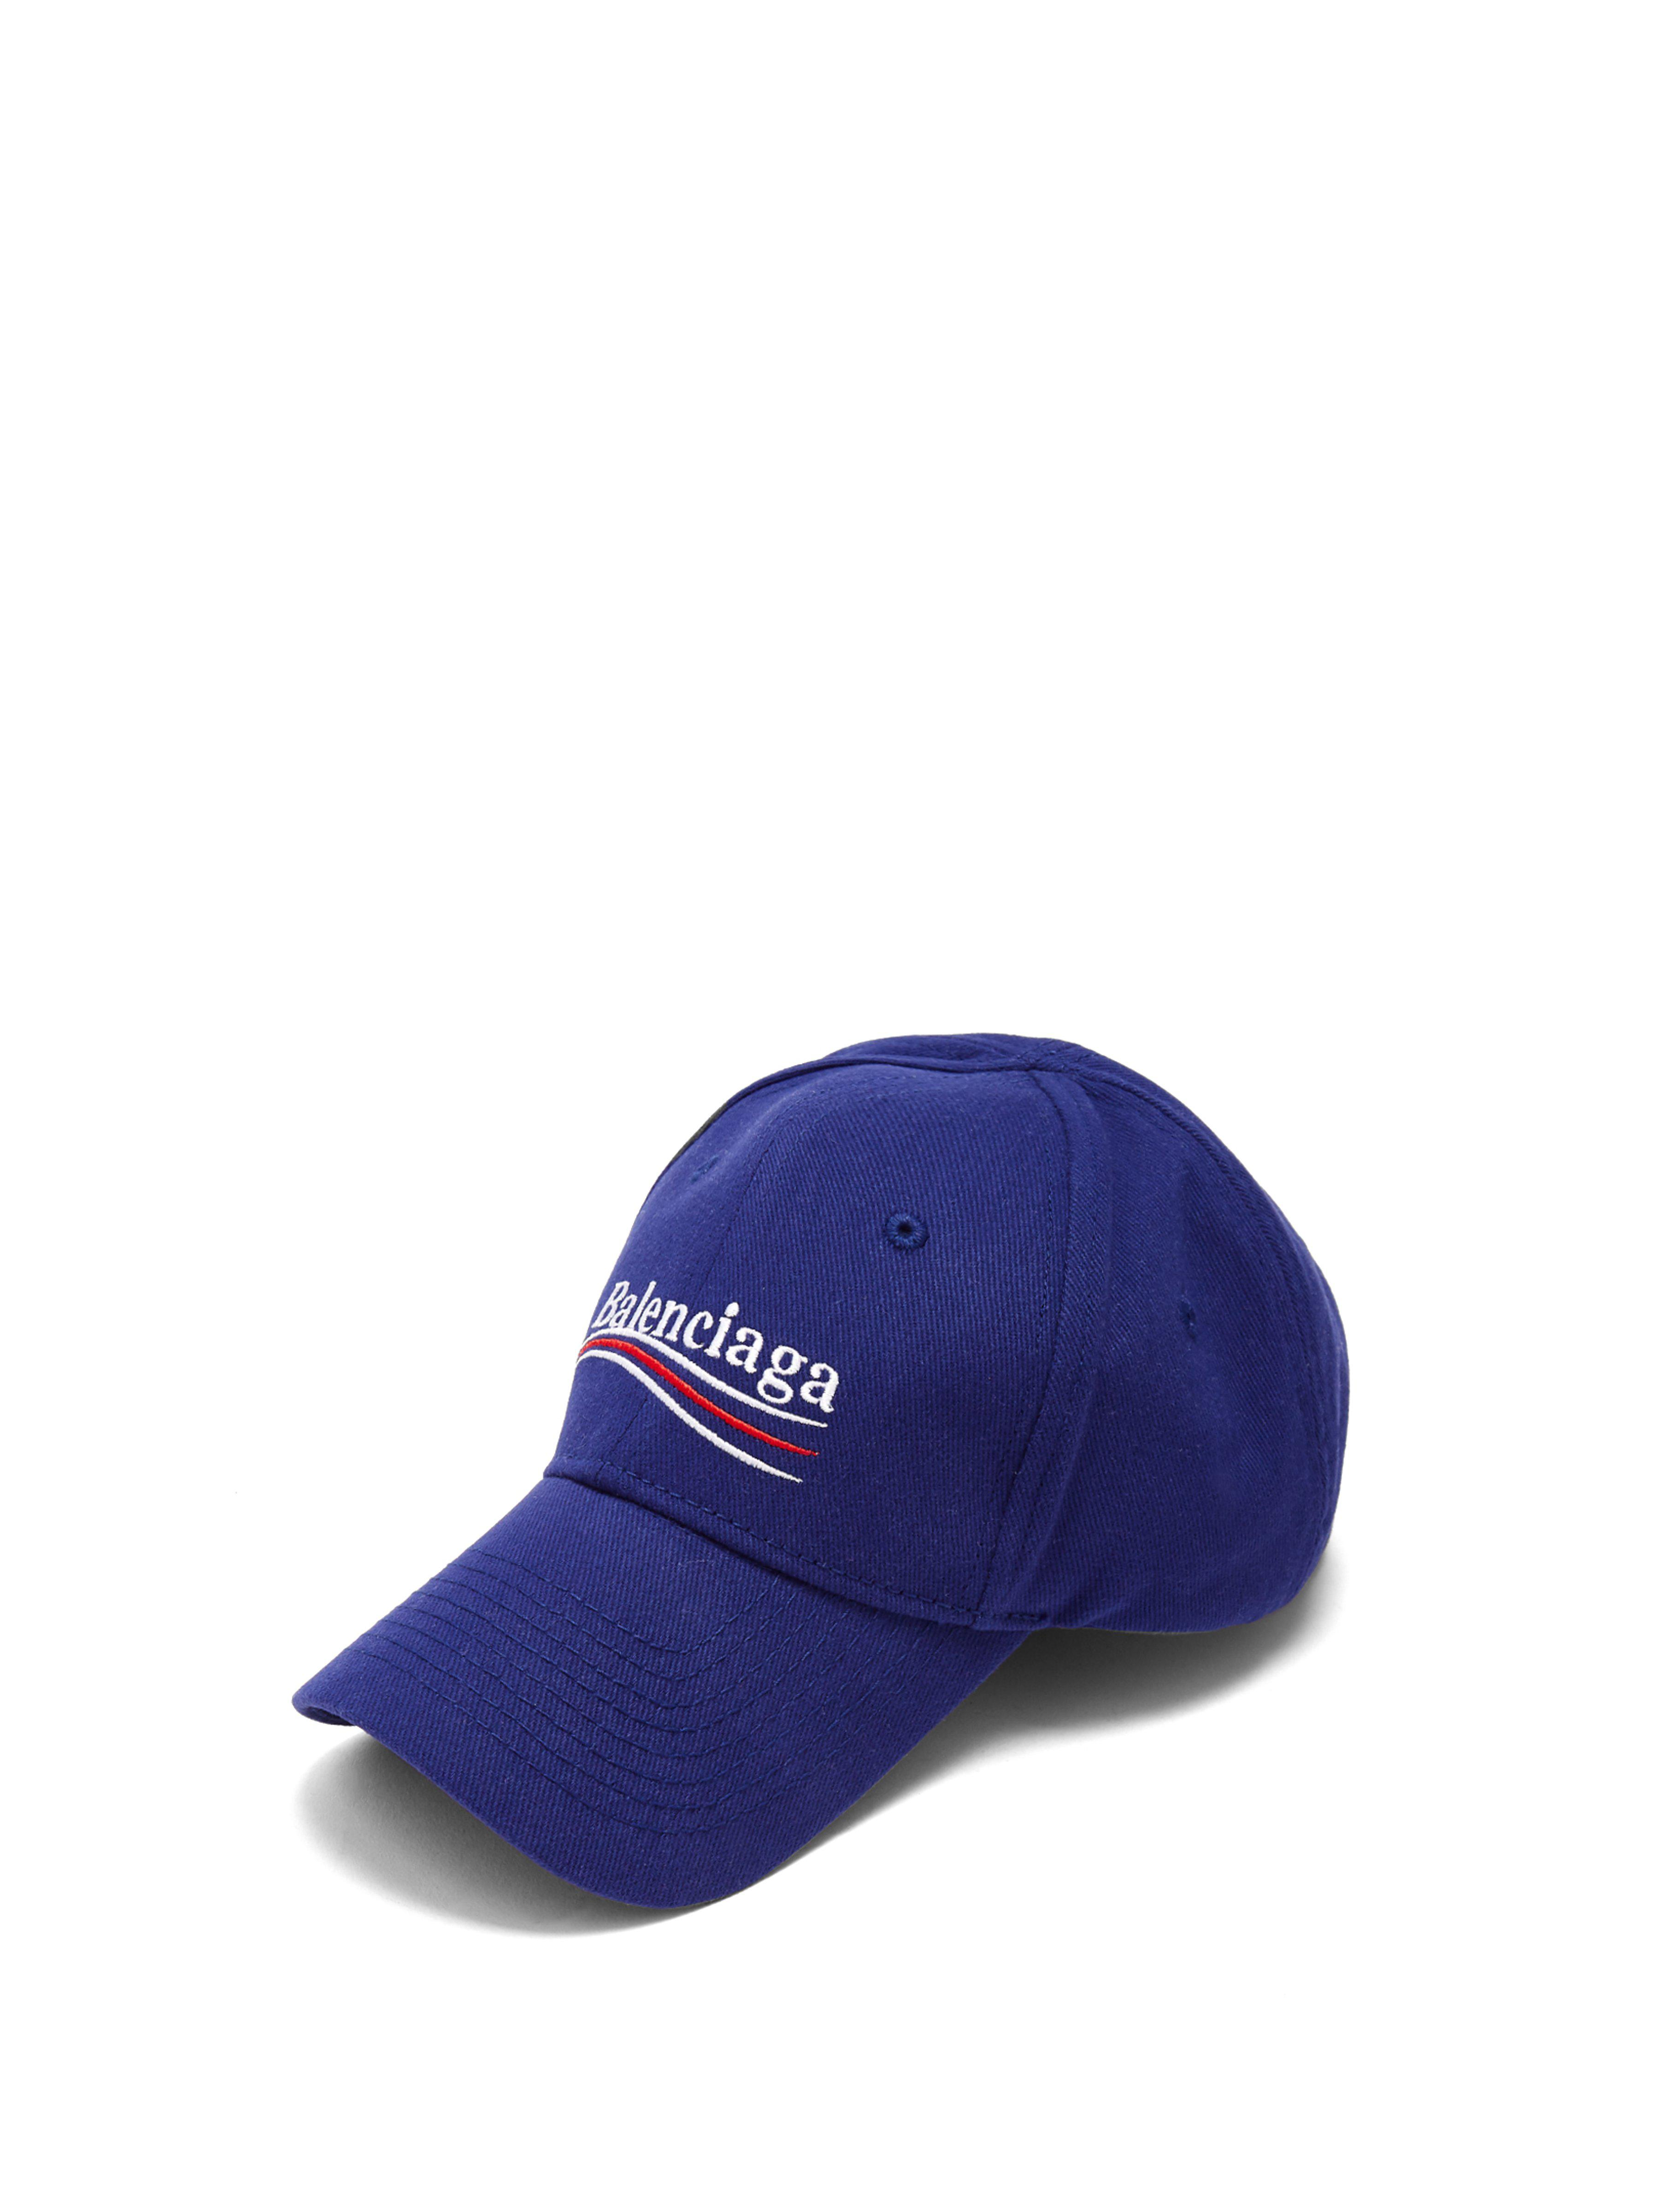 2e7ff5c8052 Balenciaga - Blue Embroidered Cotton Baseball Cap - Lyst. View fullscreen